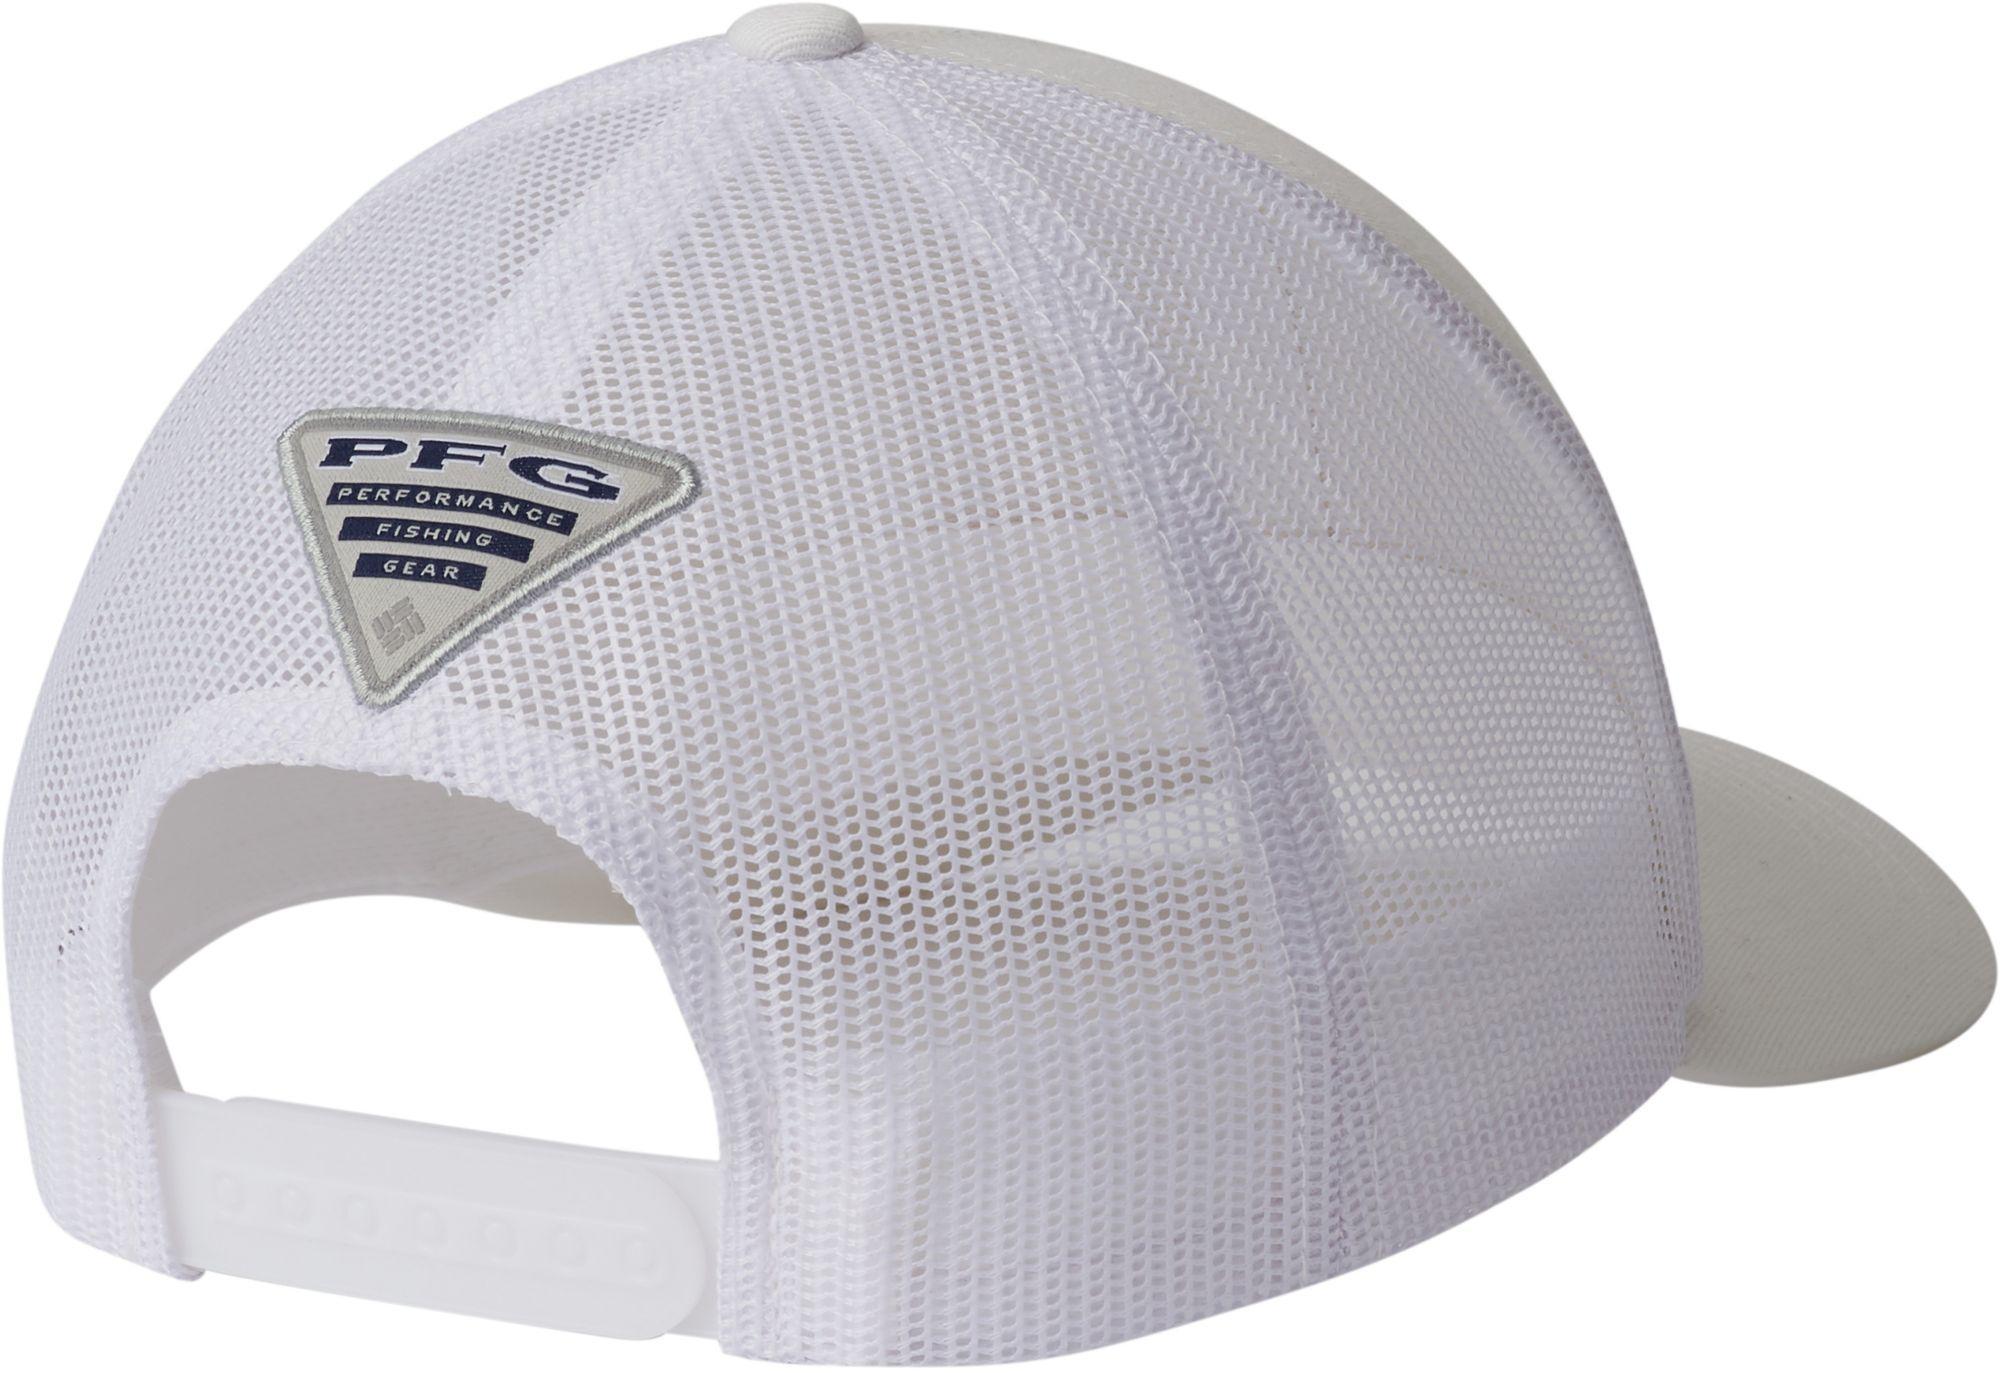 8753167a29fe9 Columbia - White Pfg Mesh Snapback Fish Flag Hat for Men - Lyst. View  fullscreen